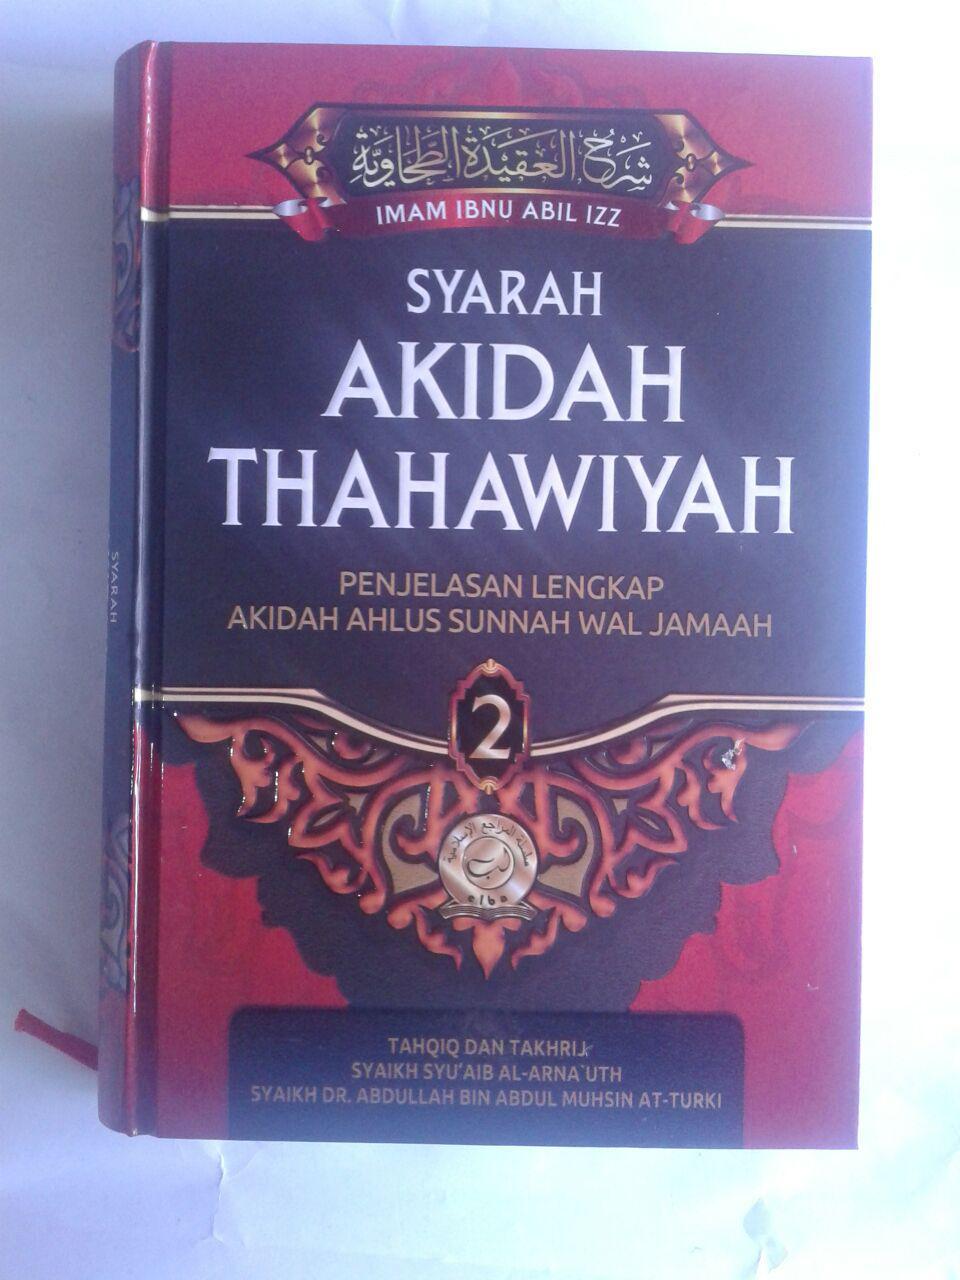 Buku Syarah Akidah Thahawiyah Akidah Ahlussunnah cover 3